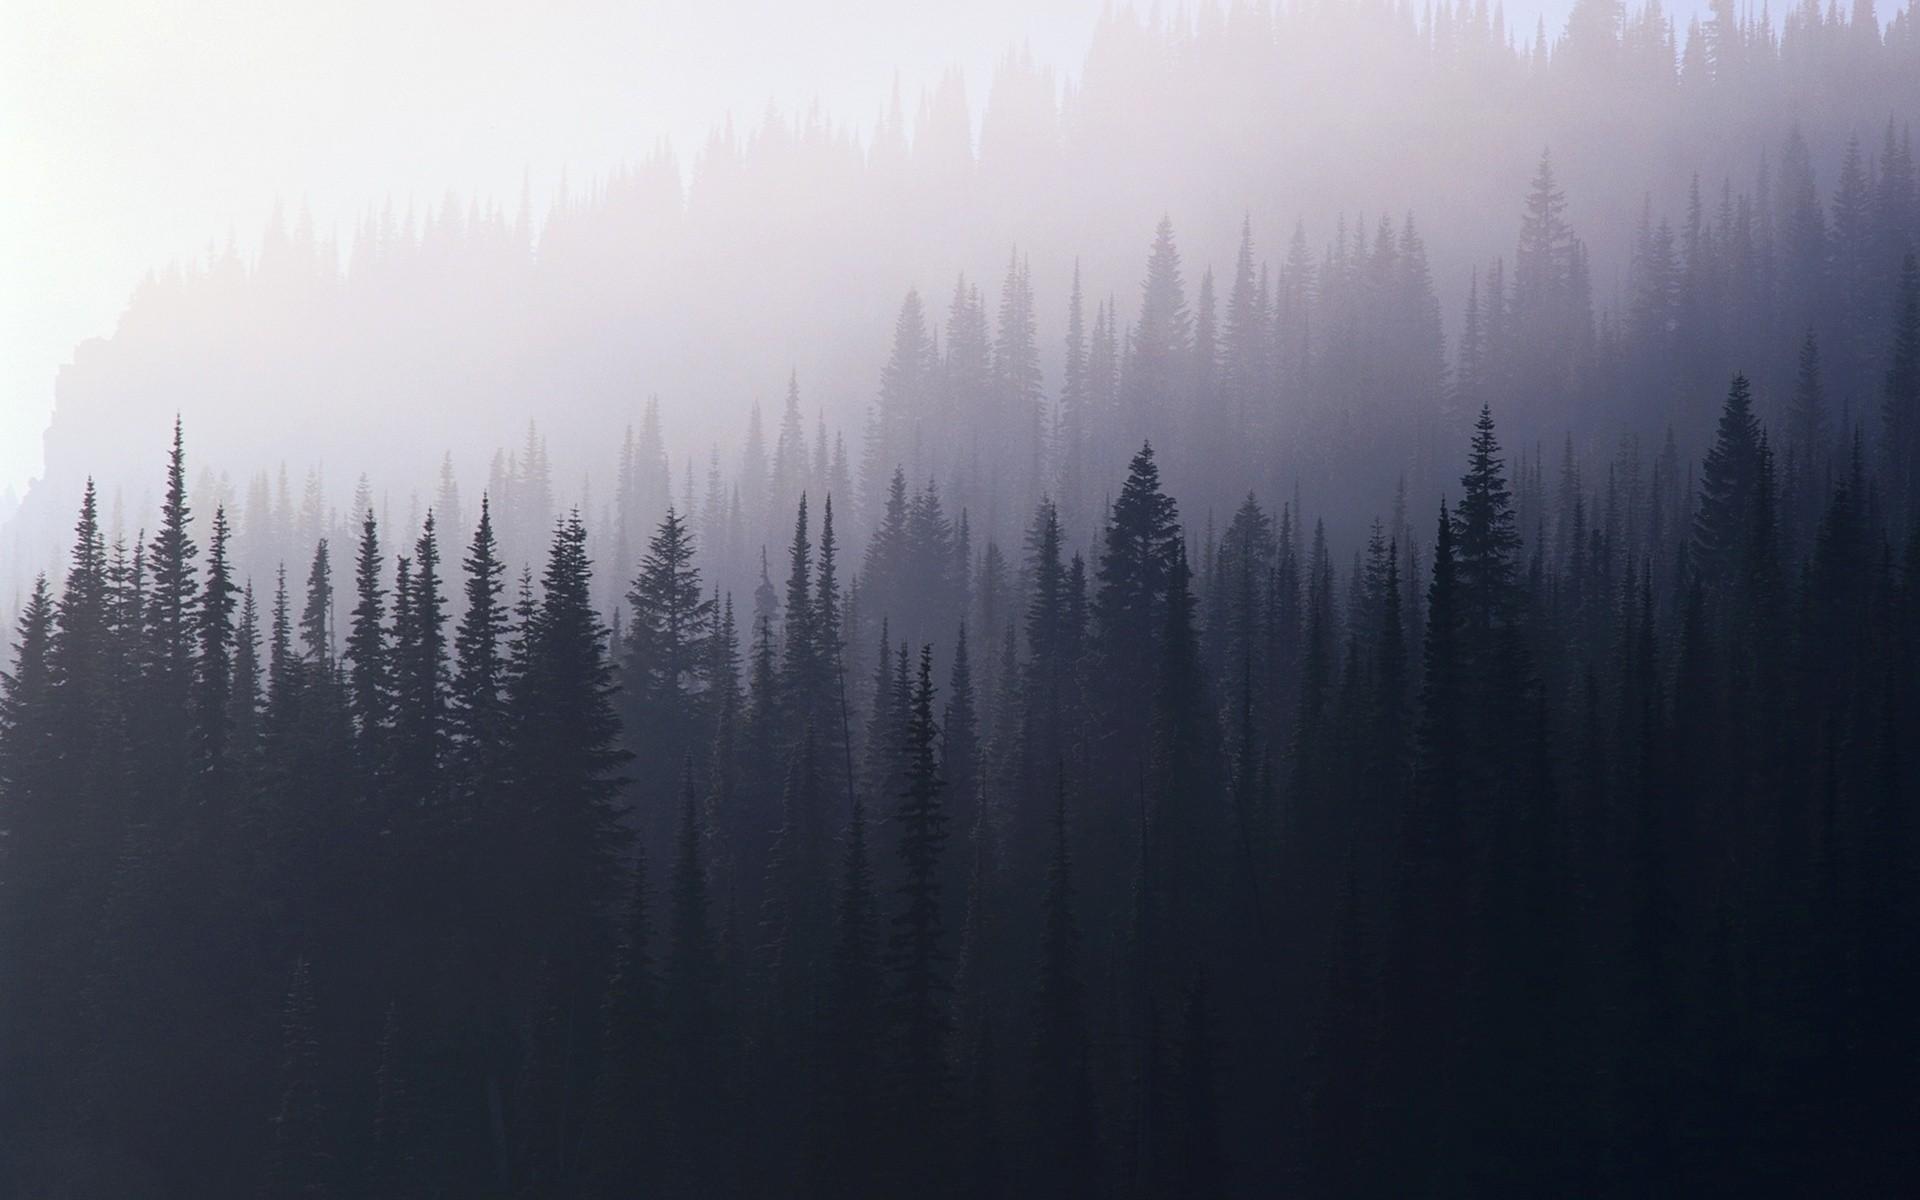 Foggy forest HD Wallpaper 1920×1080 Foggy forest HD Wallpaper 1920×1200